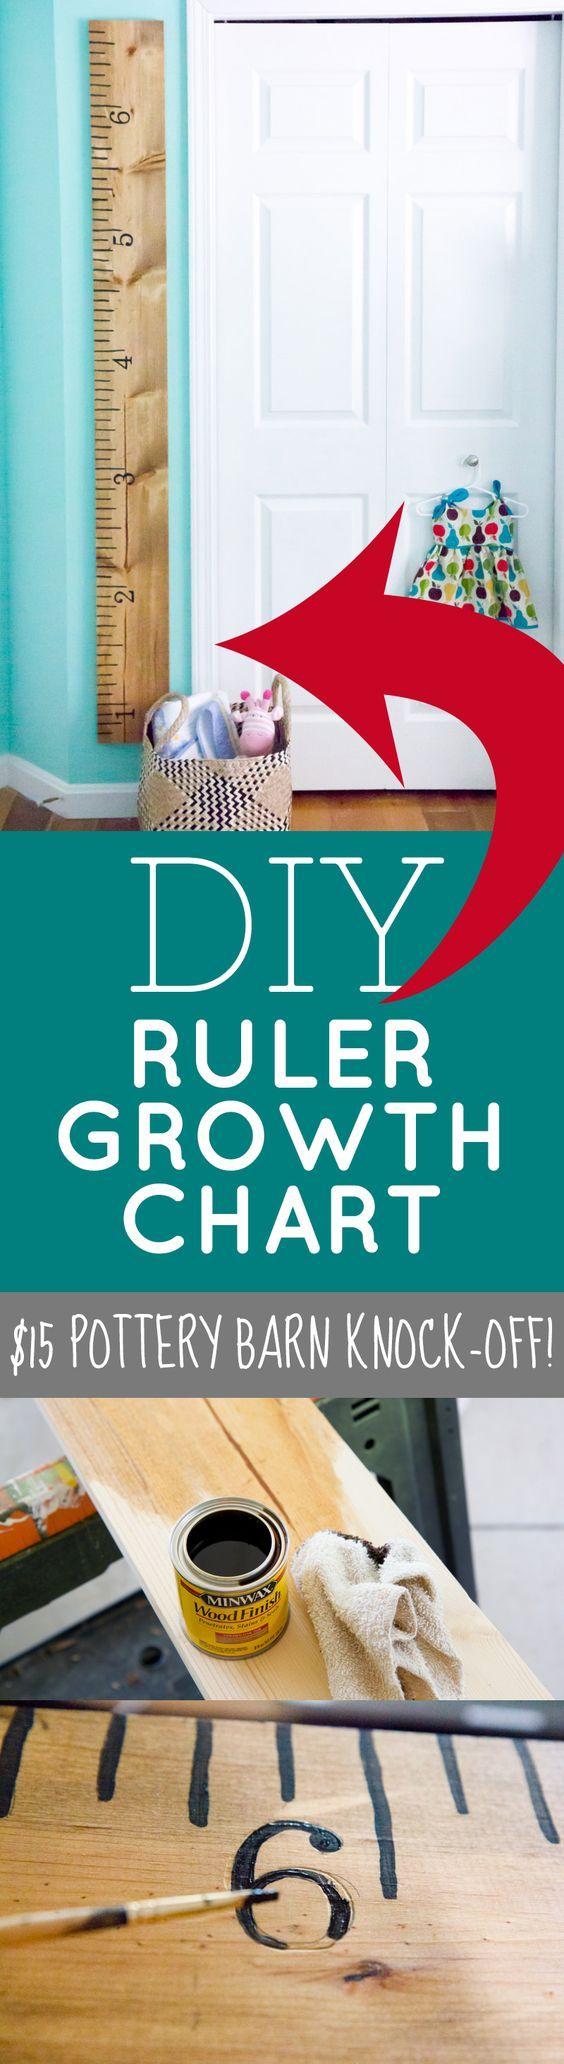 DIY Ruler Growth Chart: a frugal DIY $15 Pottery Barn Knock Off Craft!